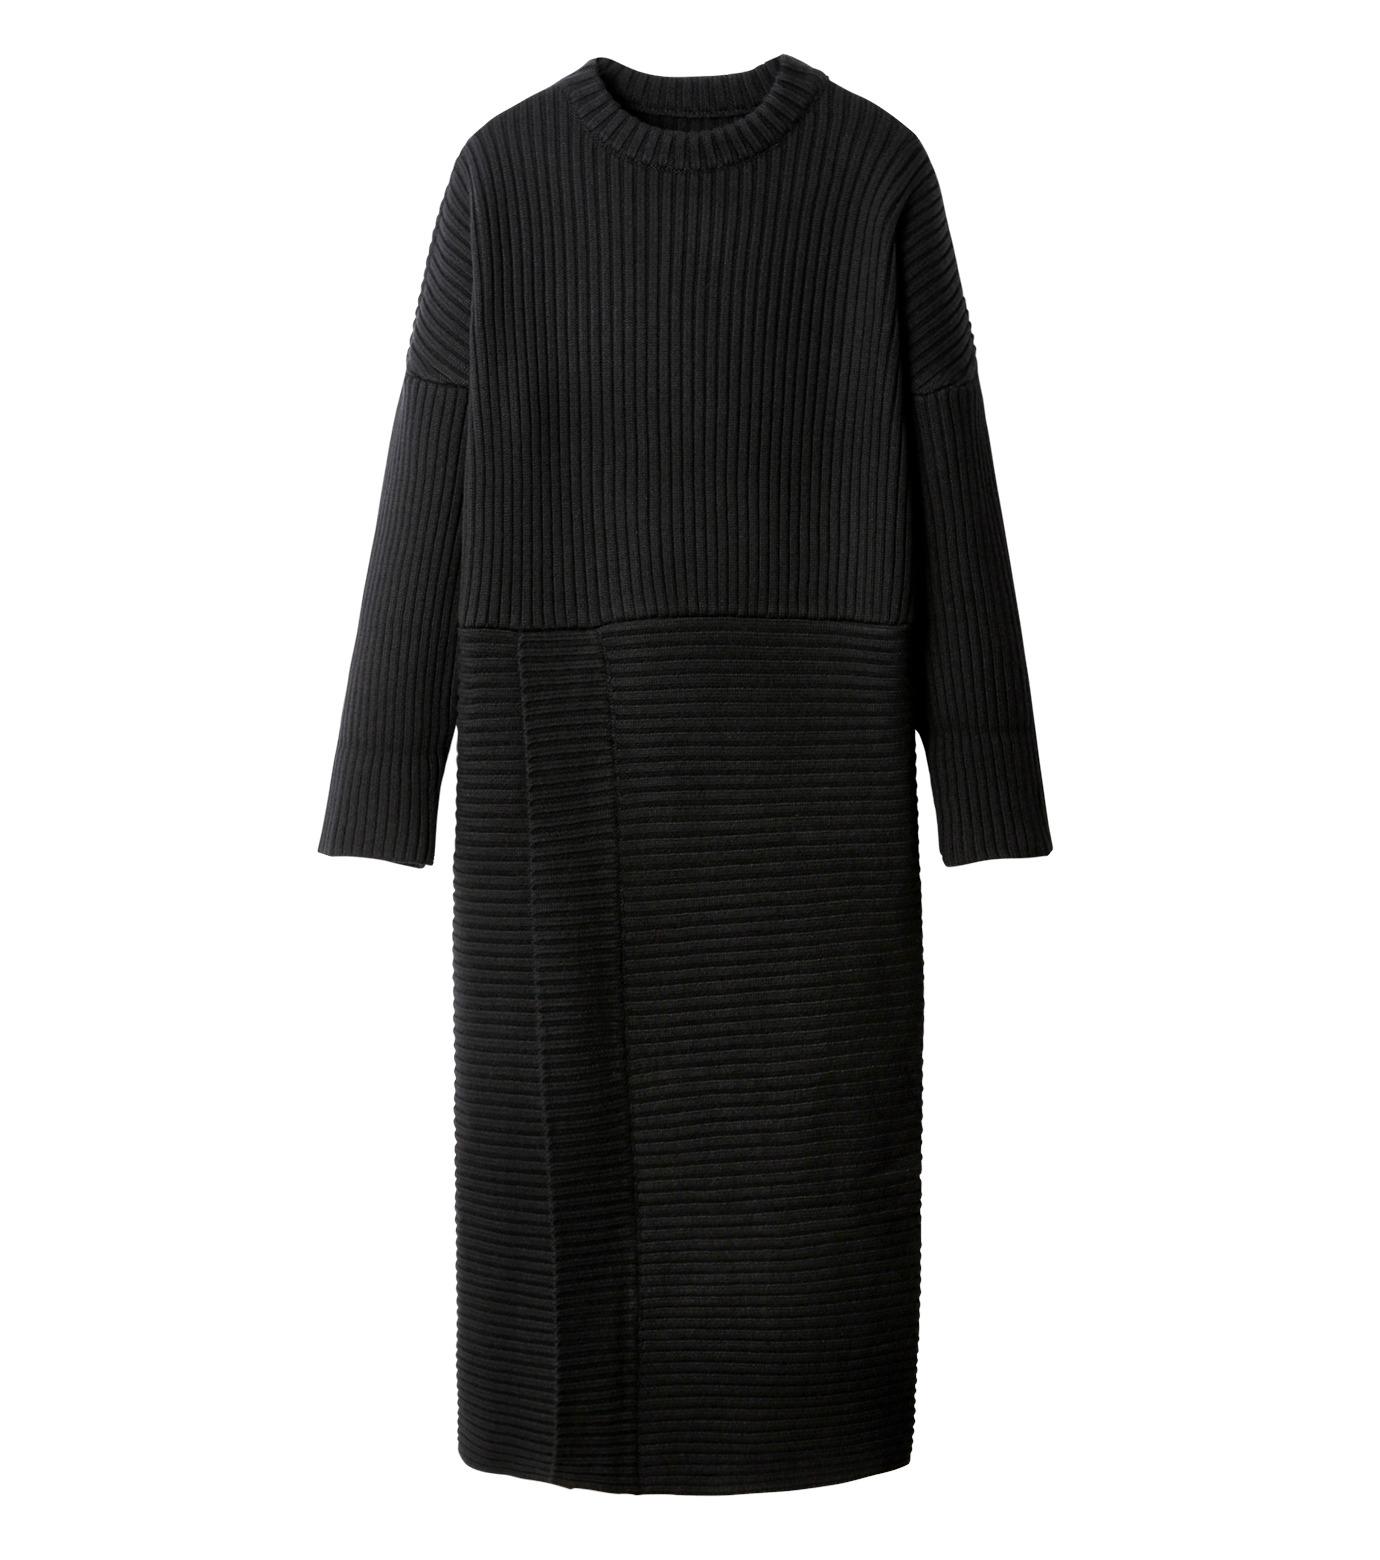 CHRISTIAN DADA(クリスチャン ダダ)のMaxi Knit Dress w/Slit-BLACK(ニット/knit)-16W-D-0806-13 拡大詳細画像4